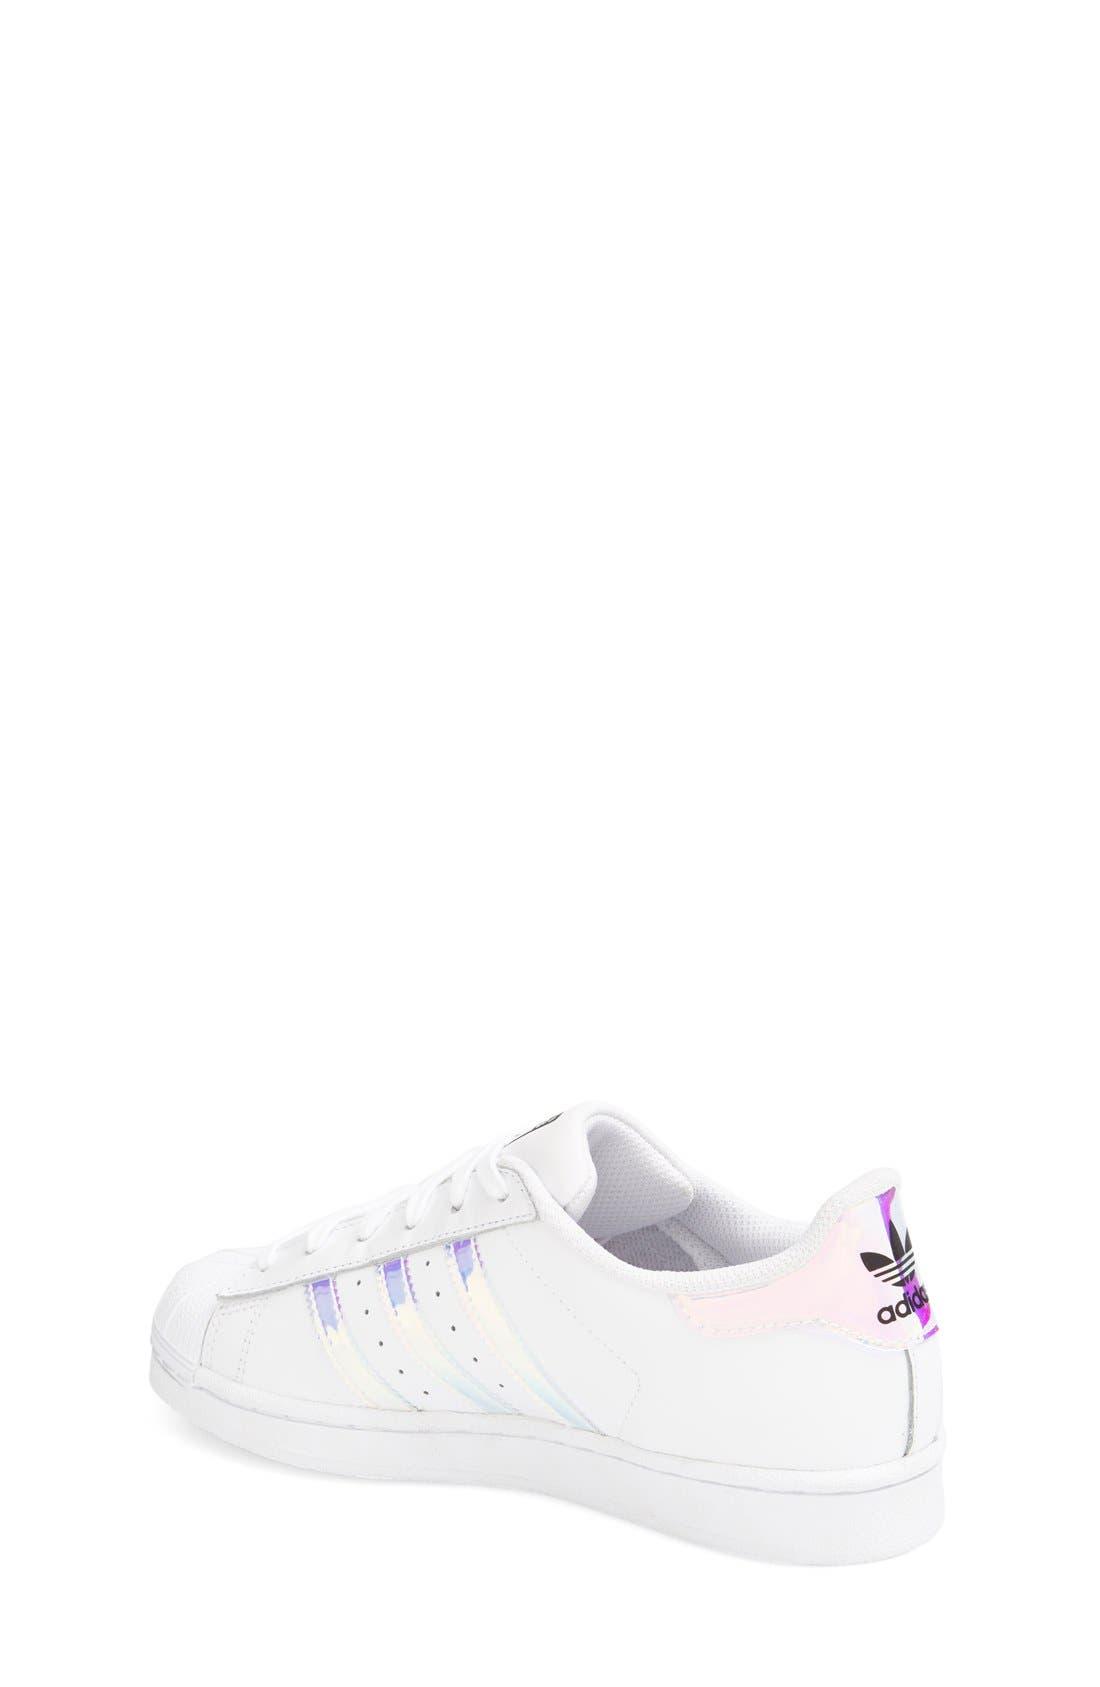 Superstar - Iridescent Sneaker,                             Alternate thumbnail 10, color,                             SILVER METALLIC/ WHITE